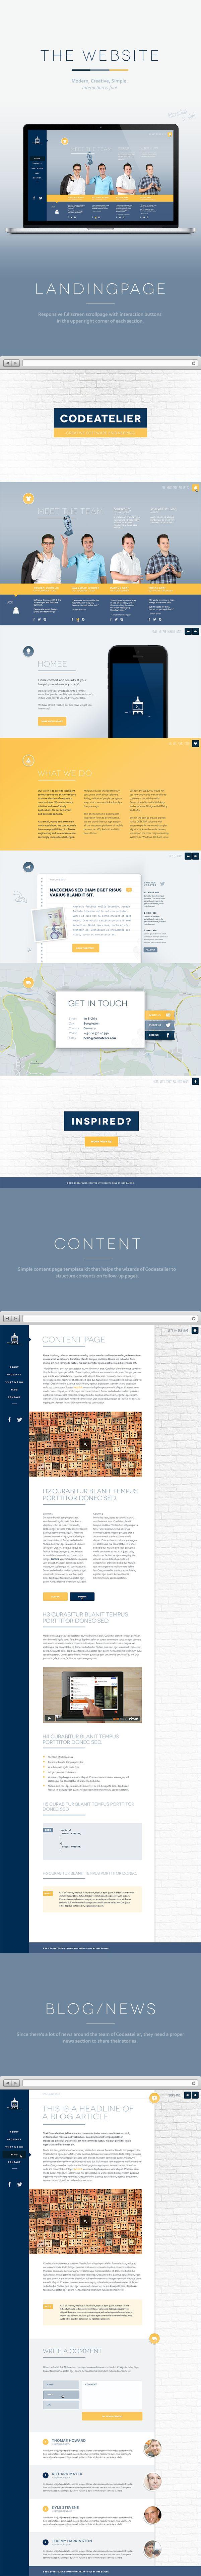 Codeatelier by Ines Gamler, via Behance#ResponsiveDesign #Website #Web #Design #UI #UX #GUI #Brand #Logo #Amazing #Site #GraphicDesign